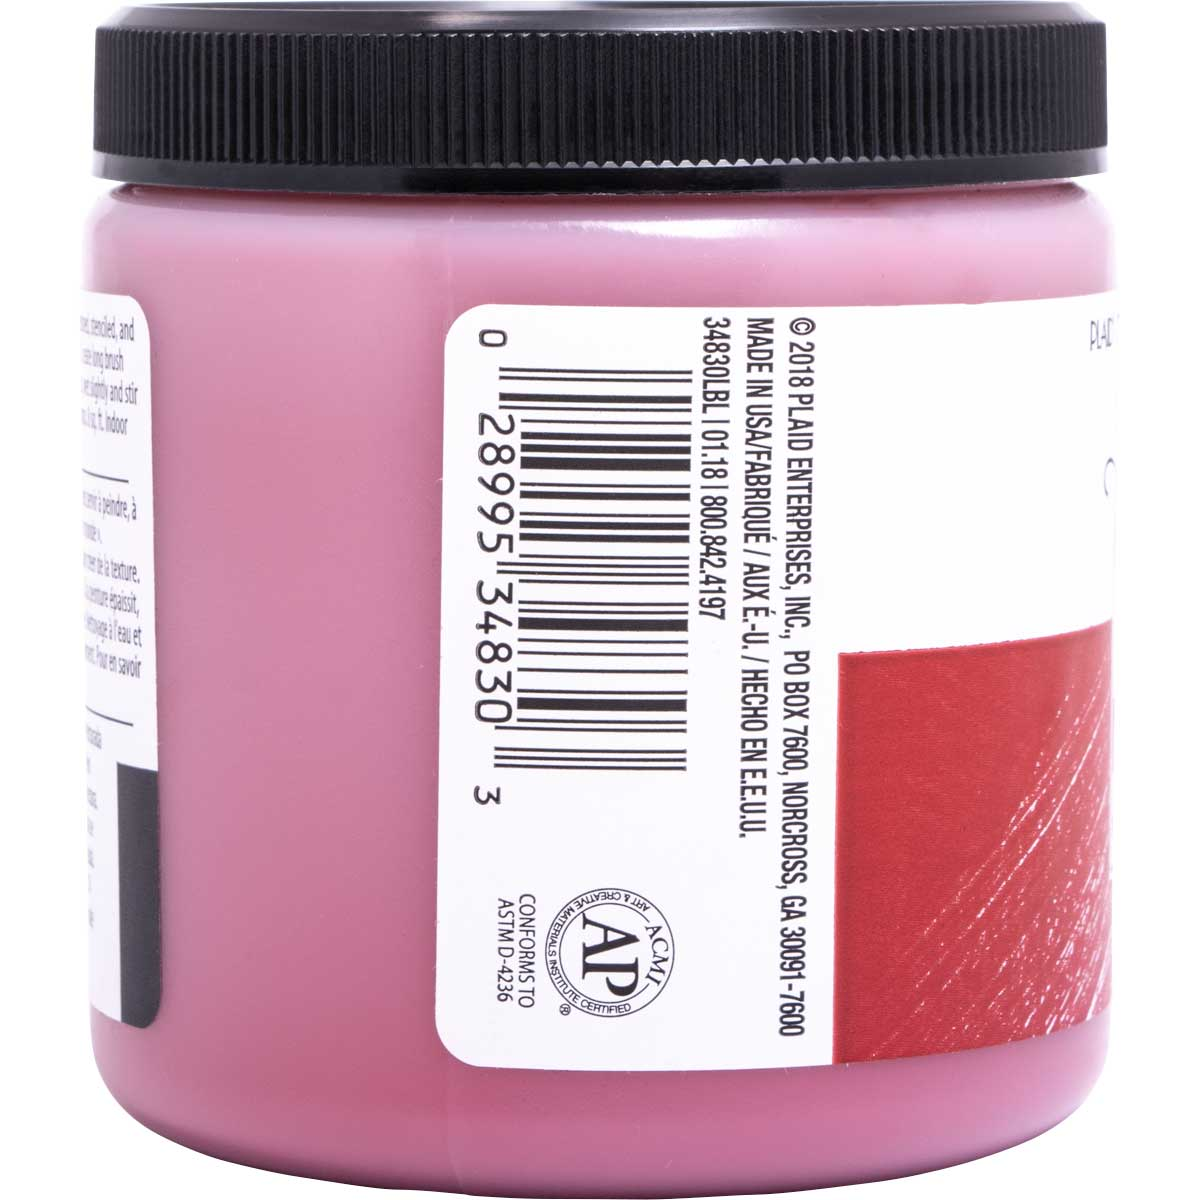 FolkArt ® Home Decor ® Texture Chalk™ - Barn Door, 8 oz.